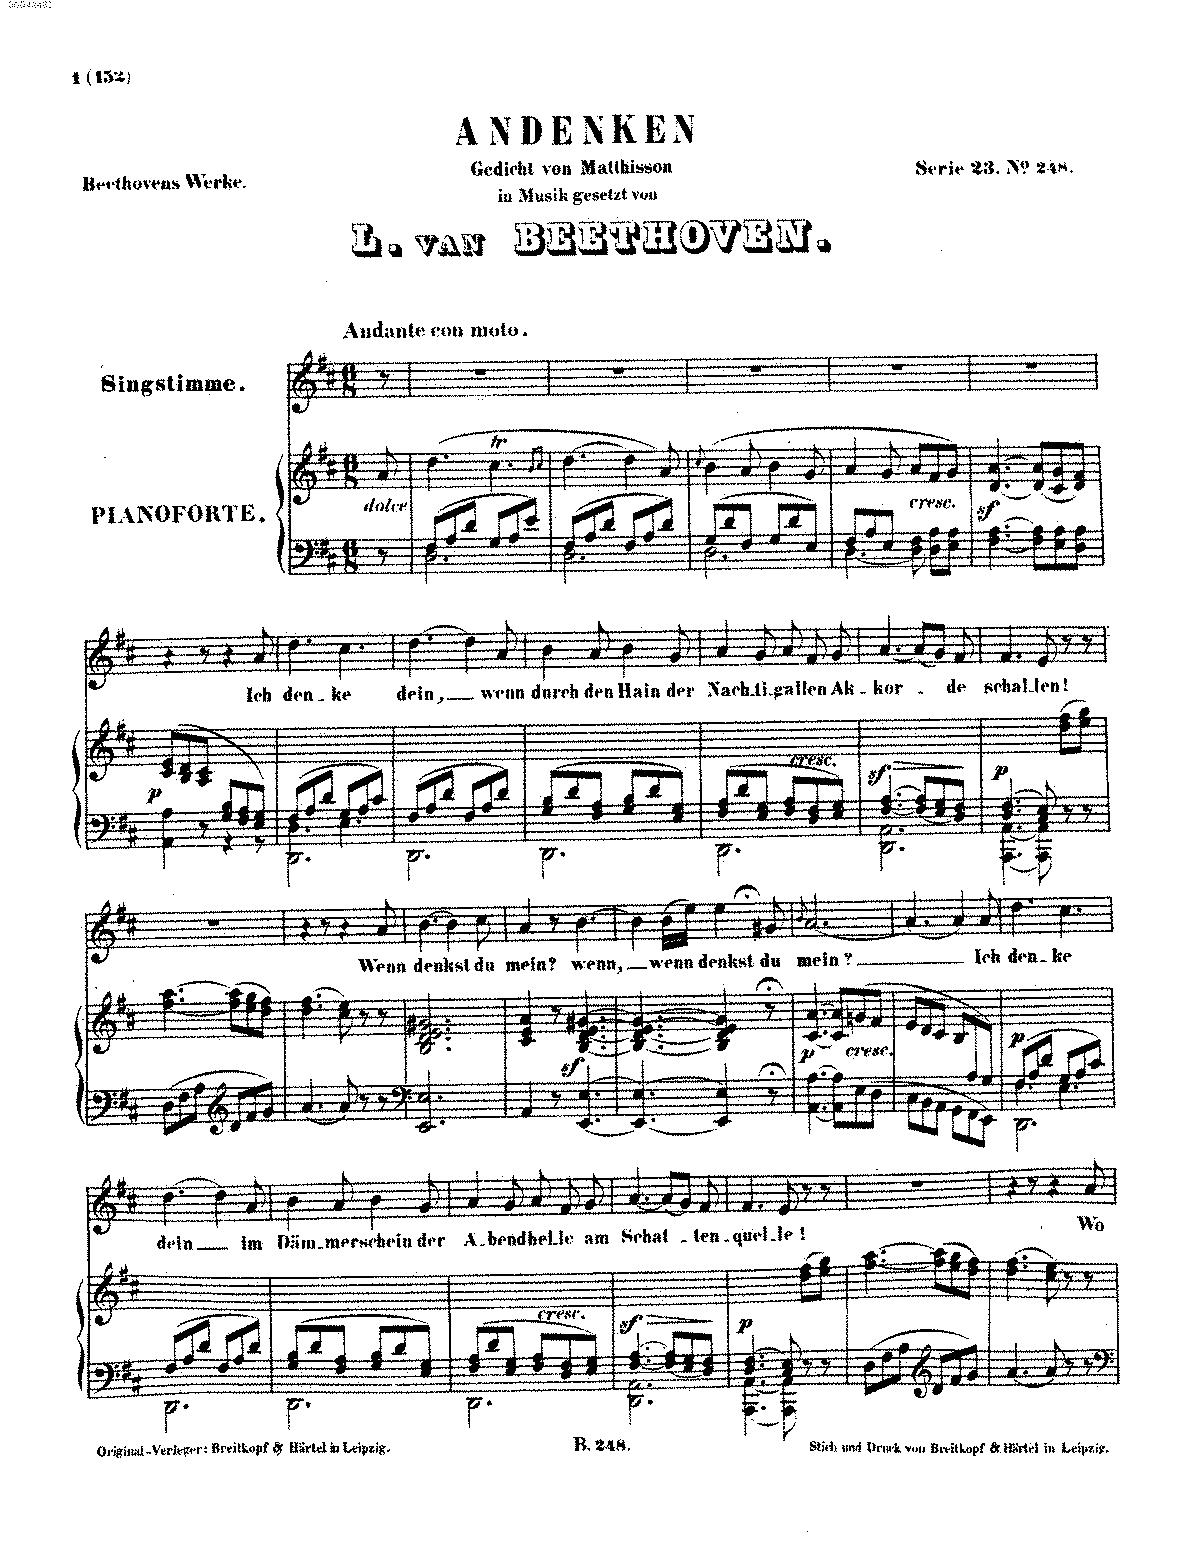 andenken woo beethoven ludwig van petrucci music complete